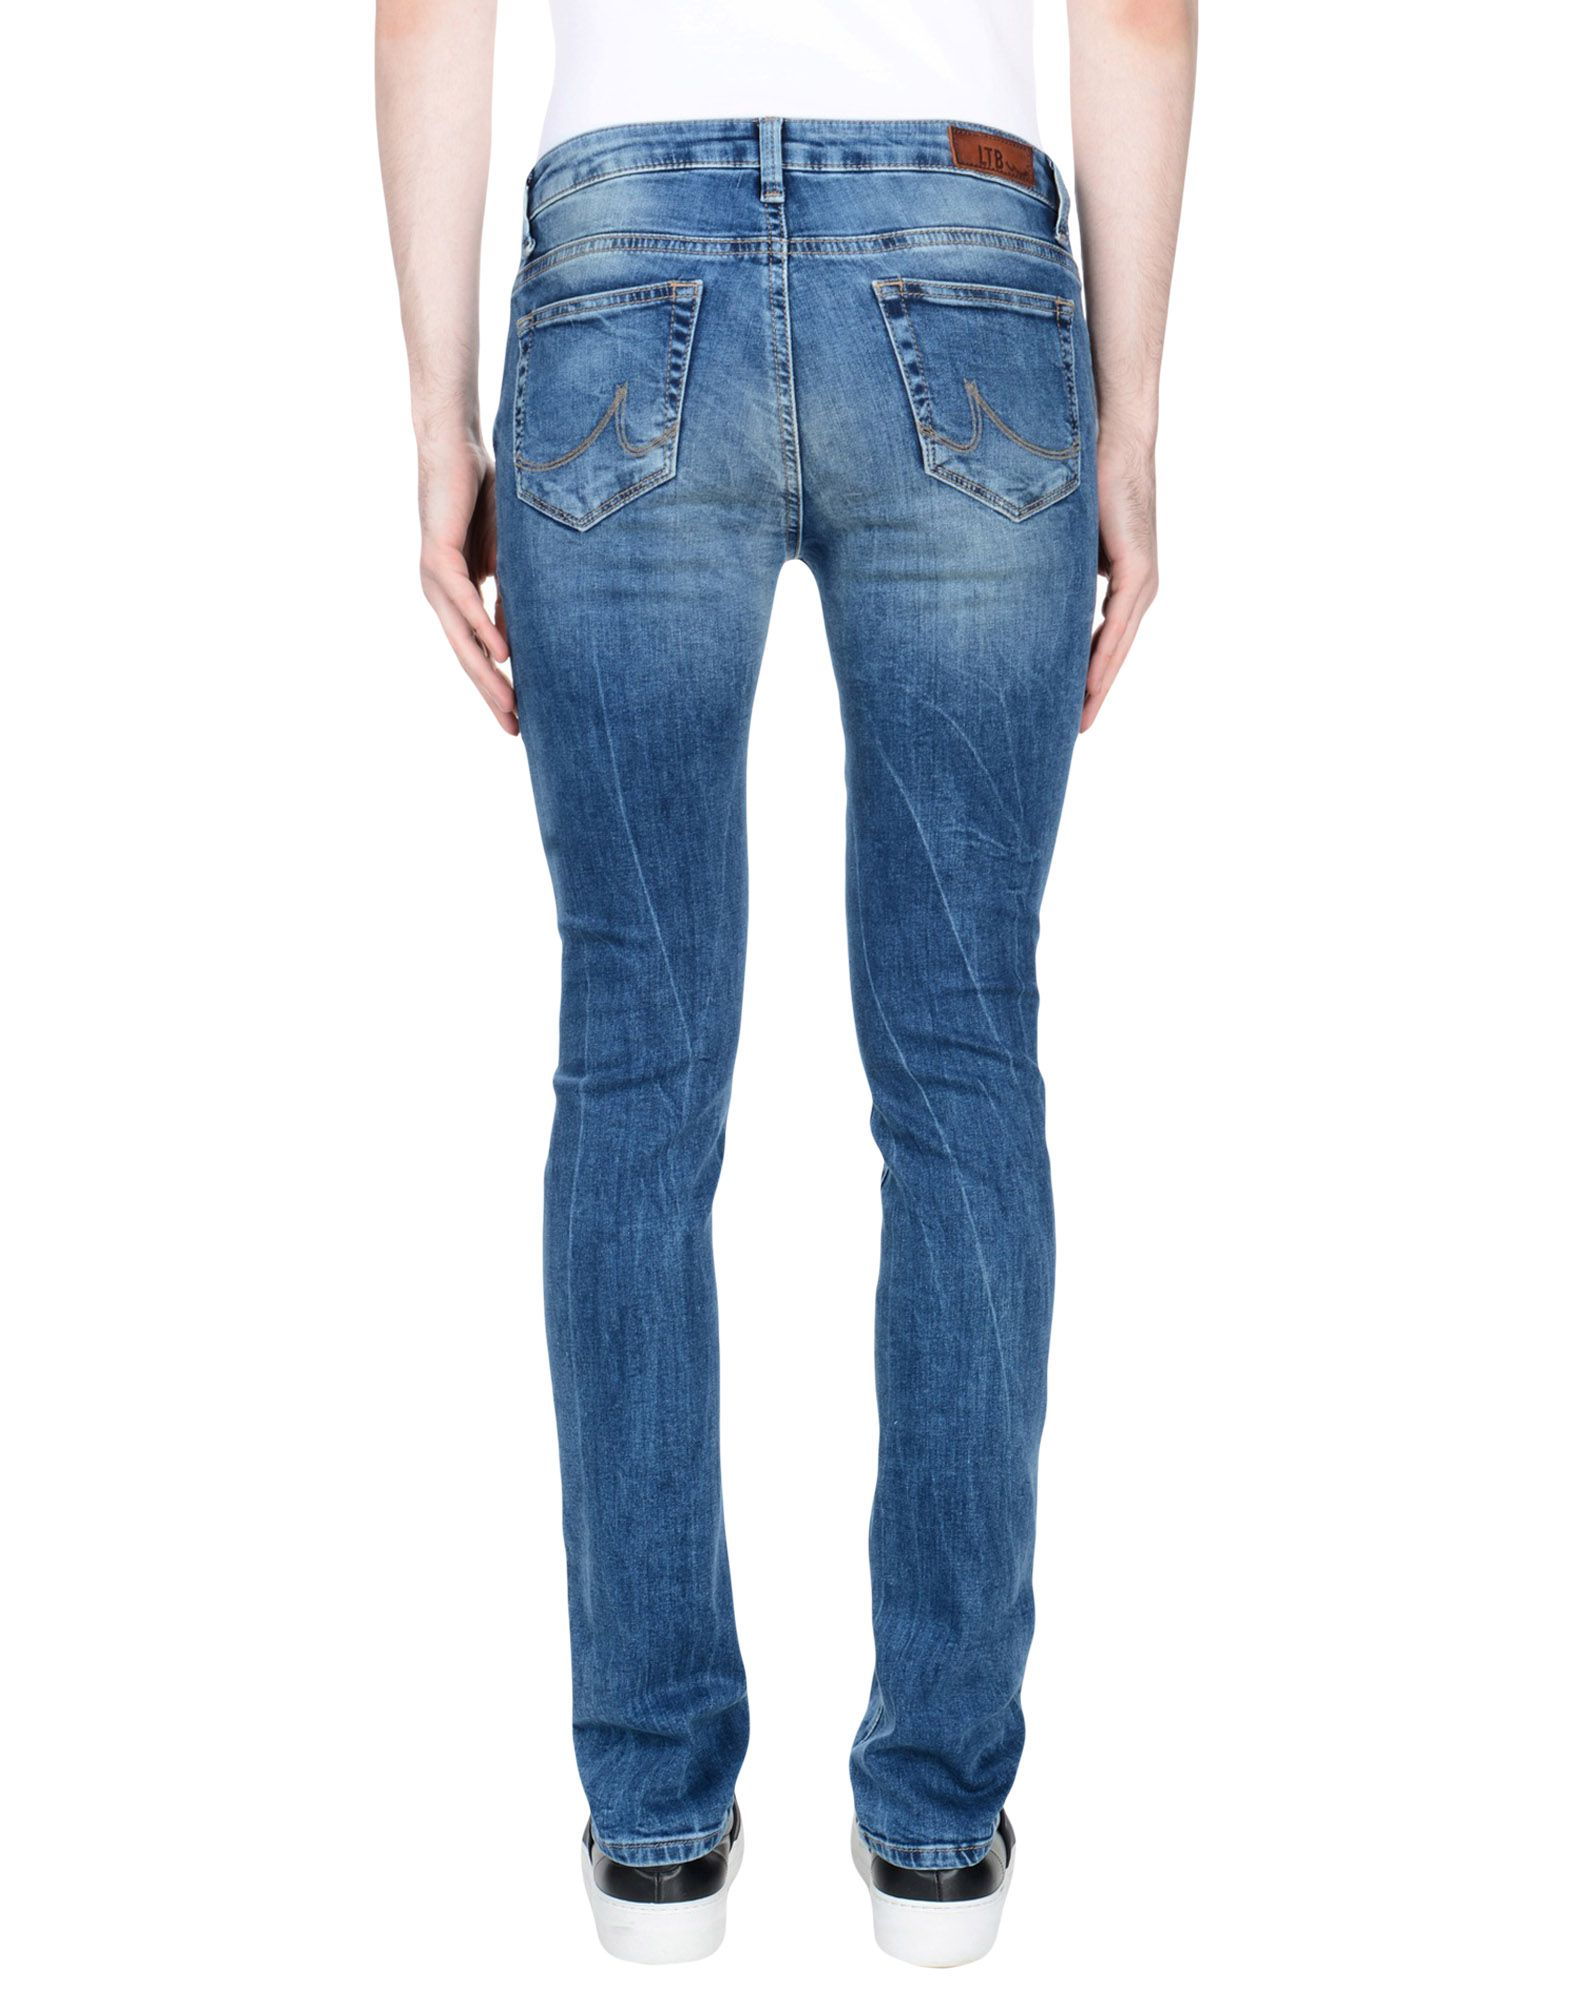 Pantaloni Jeans Ltb Uomo - 42665024UH 42665024UH - 219bda